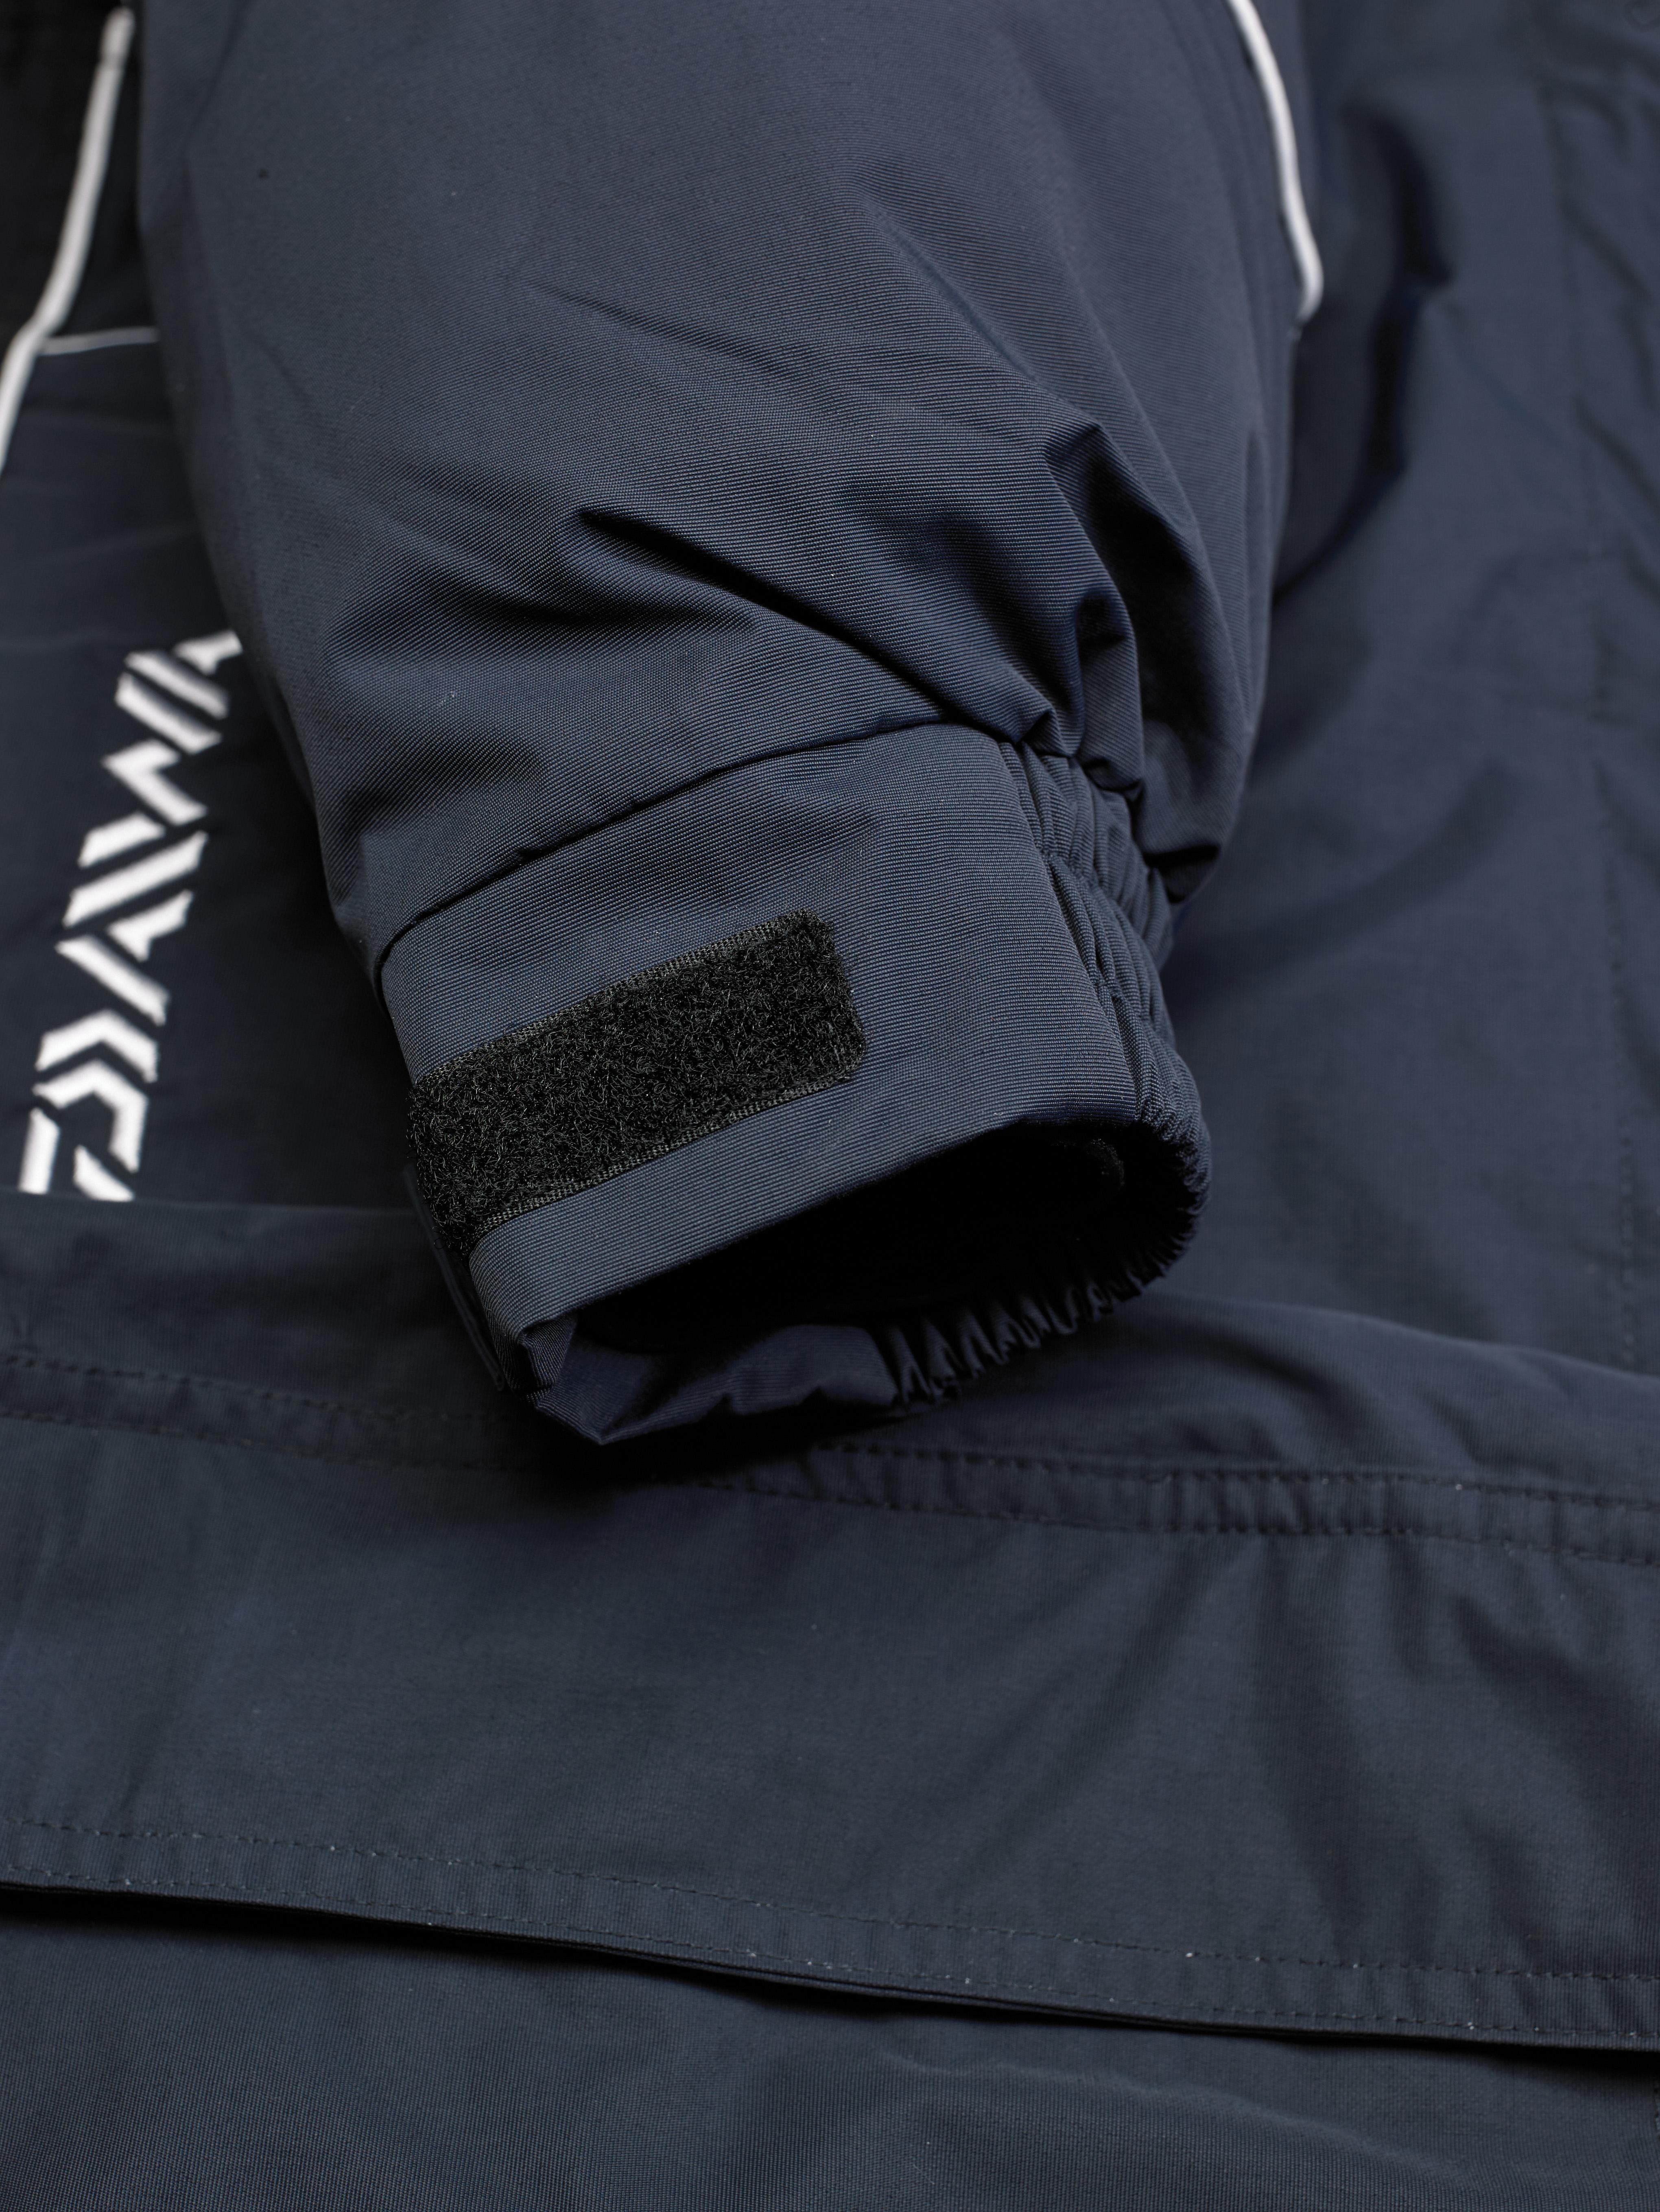 3aad0c7dd3d Daiwa Igloo Match 2pc Suit – Glasgow Angling Centre